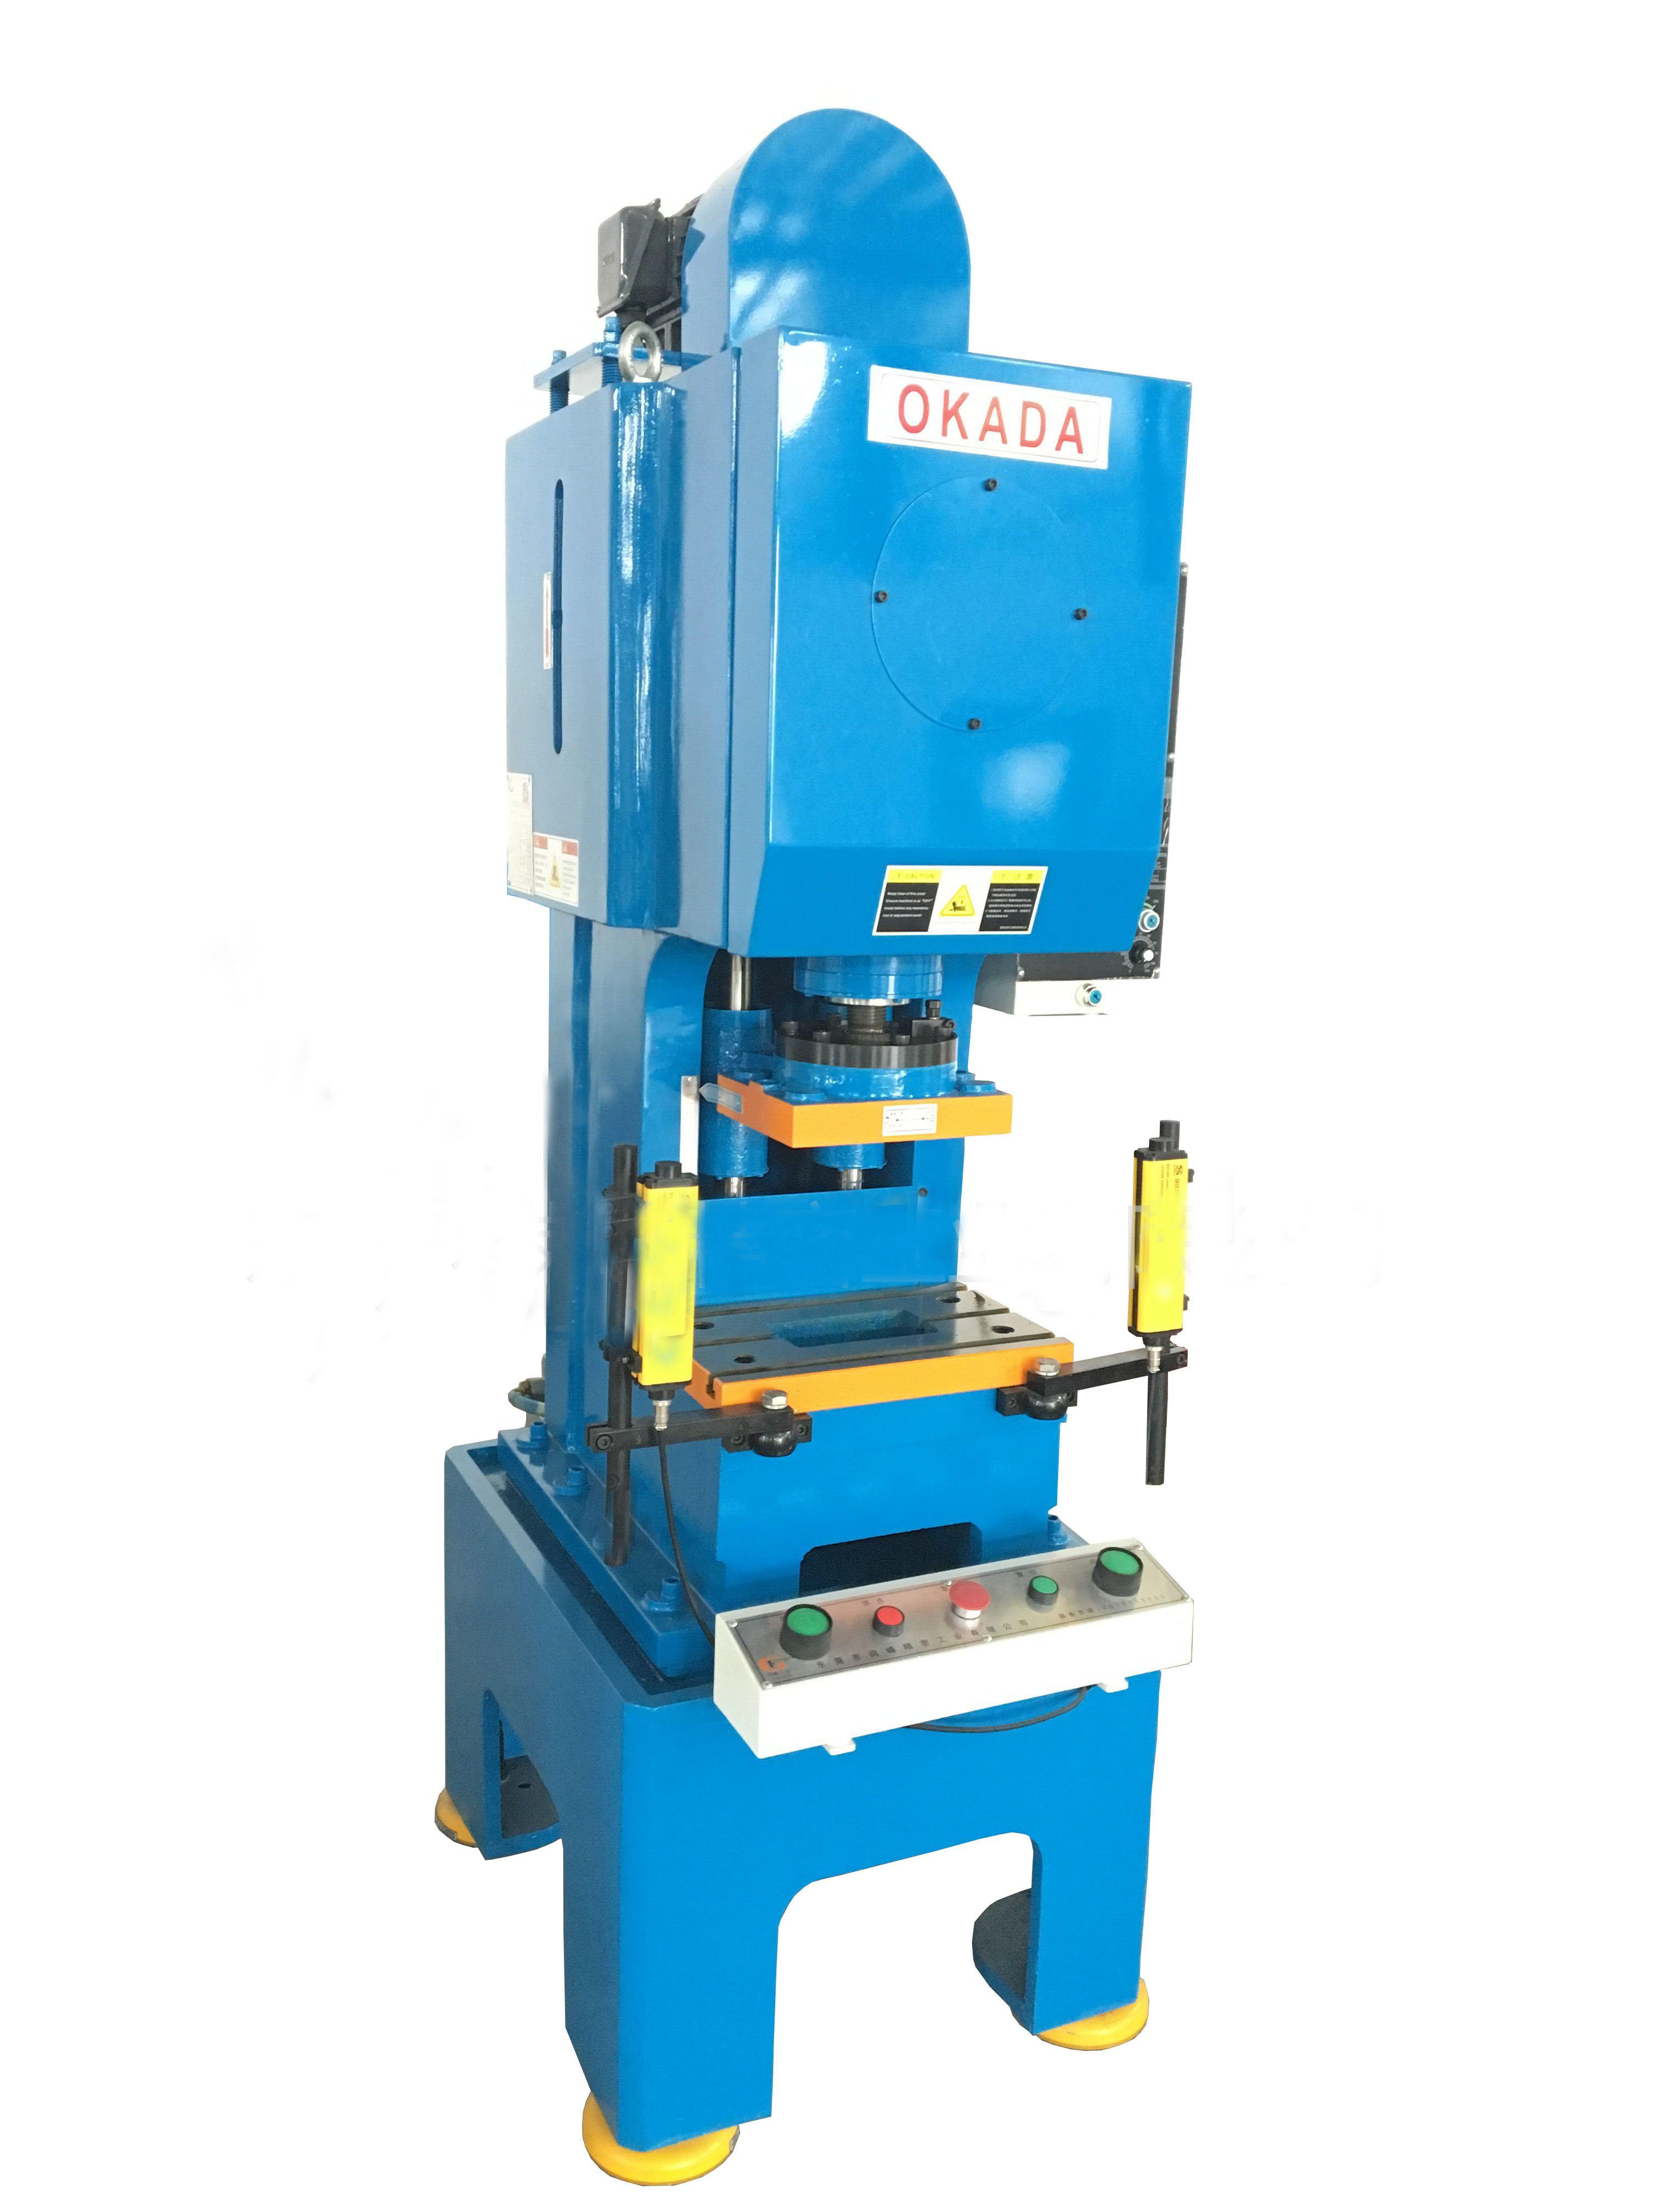 OKADA 厂家直销 伺服微型冲床质量保证GF-15